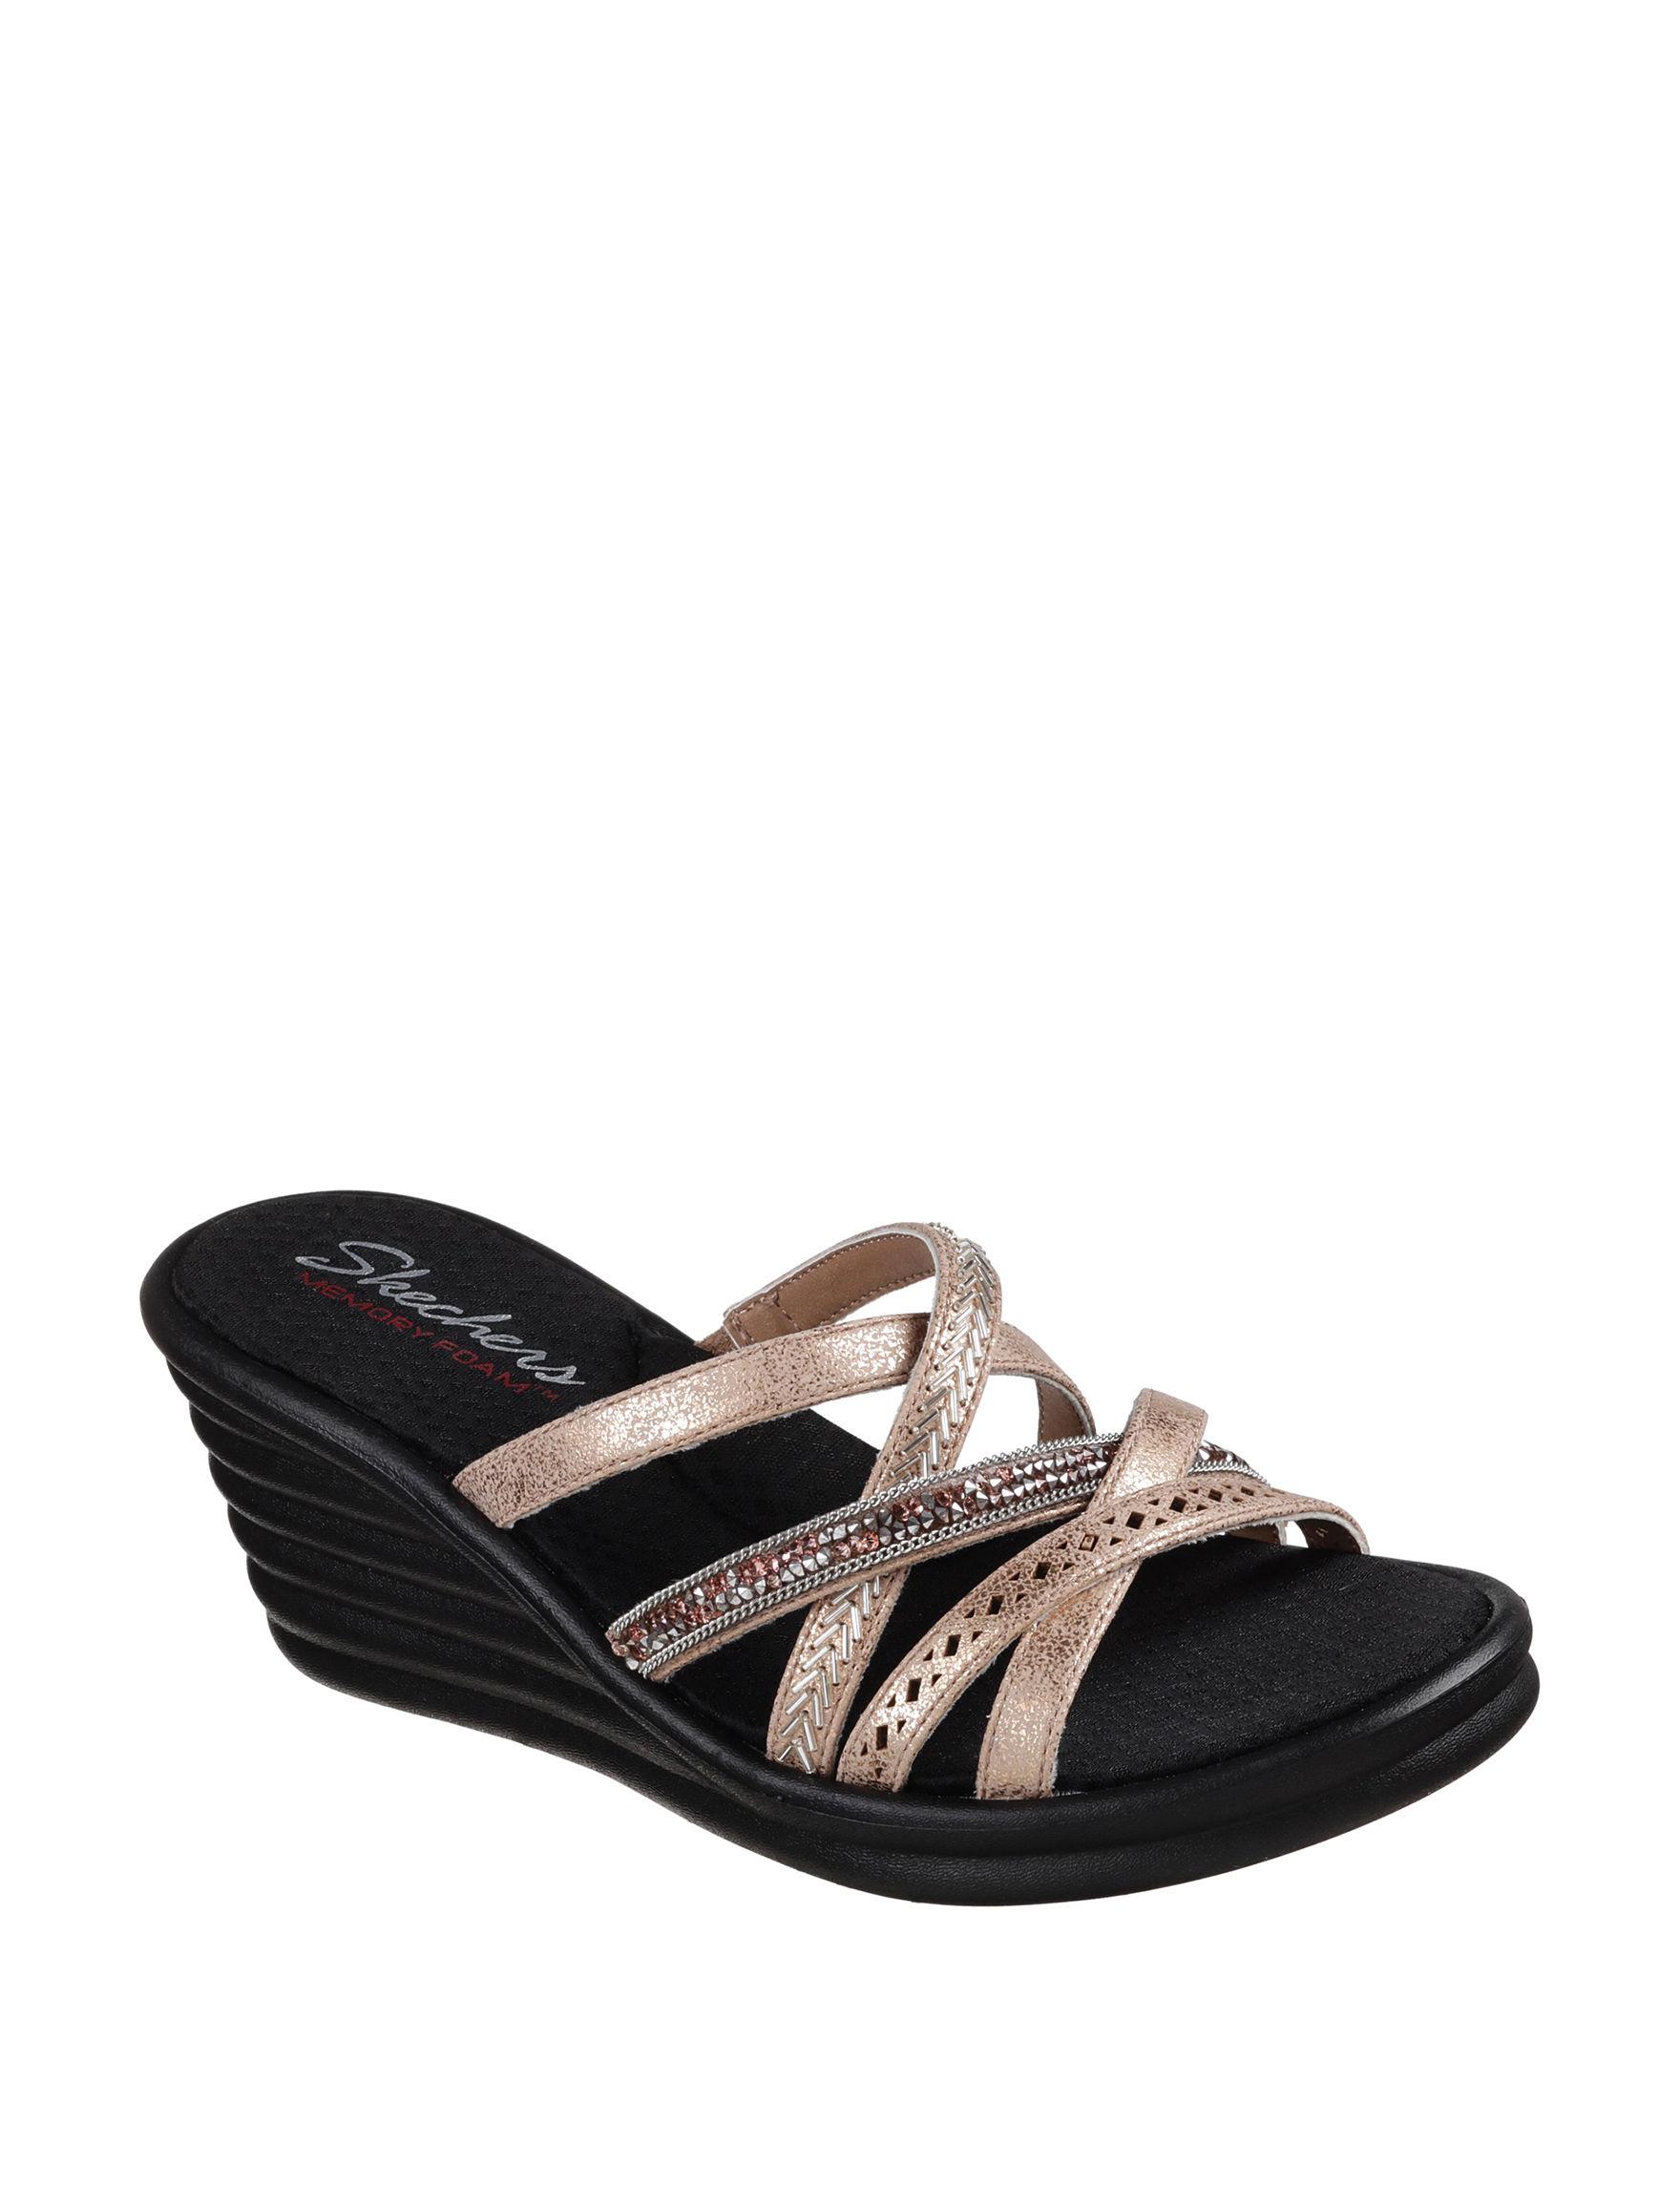 Skechers Gold Wedge Sandals